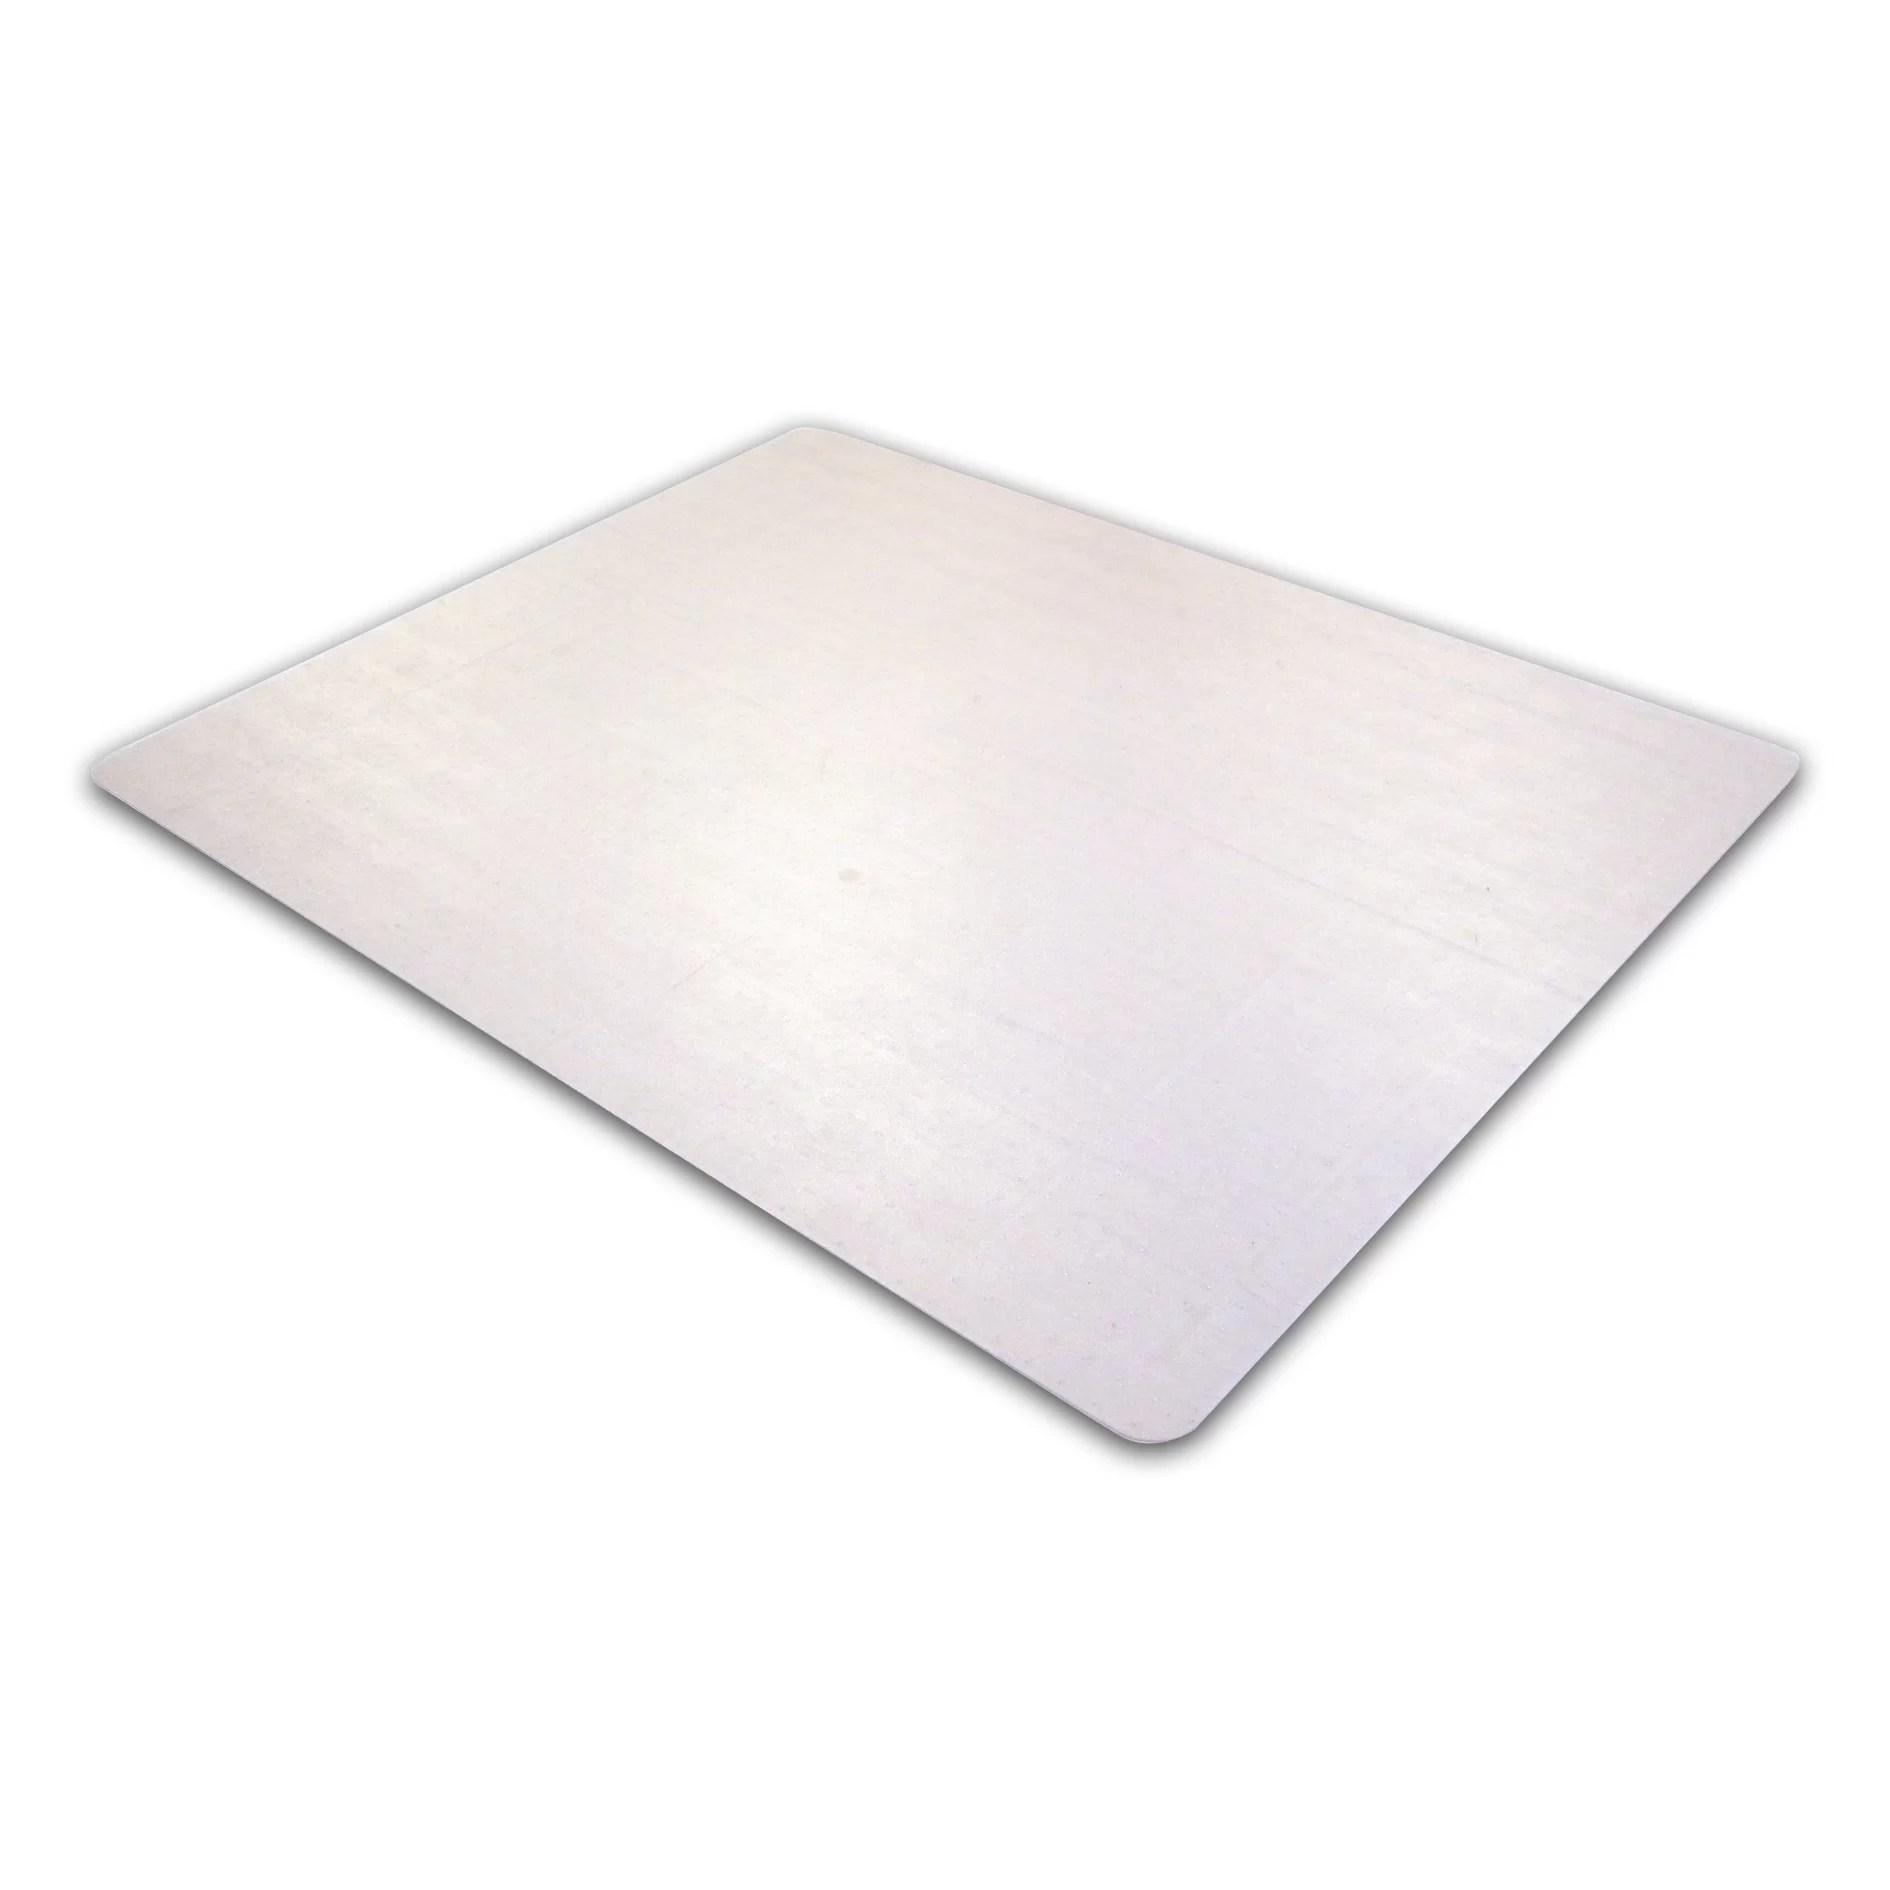 desk chair mat for high pile carpet plastic resin adirondack chairs floortex ecotex standard and reviews